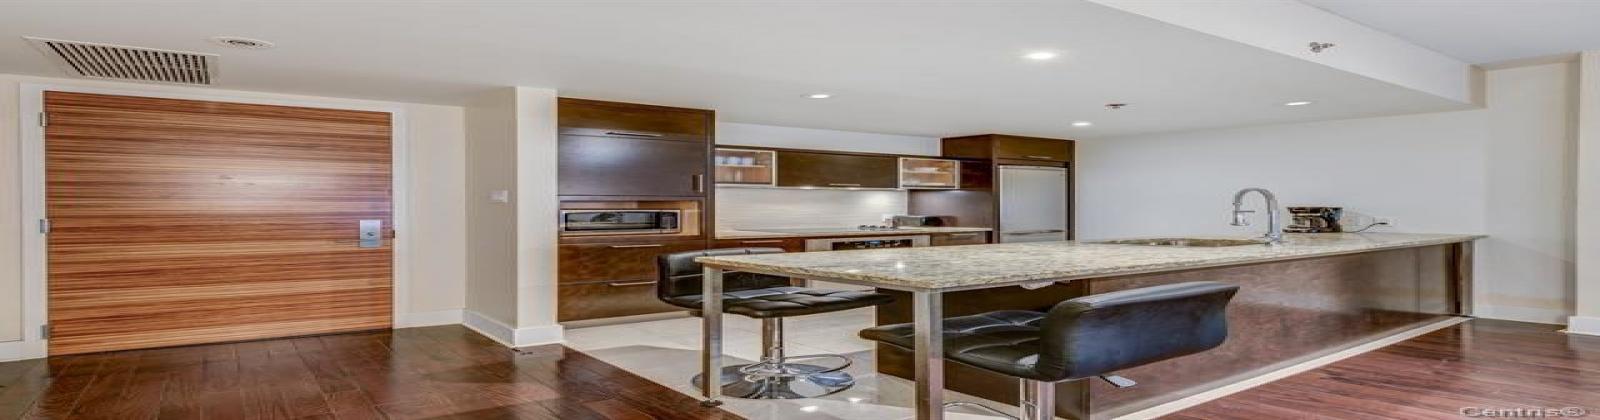 St-Andrée 407 370 St,Montreal,Quebec,1 Bedroom Bedrooms,1 BathroomBathrooms,Apartment,Solana,370,4,1007